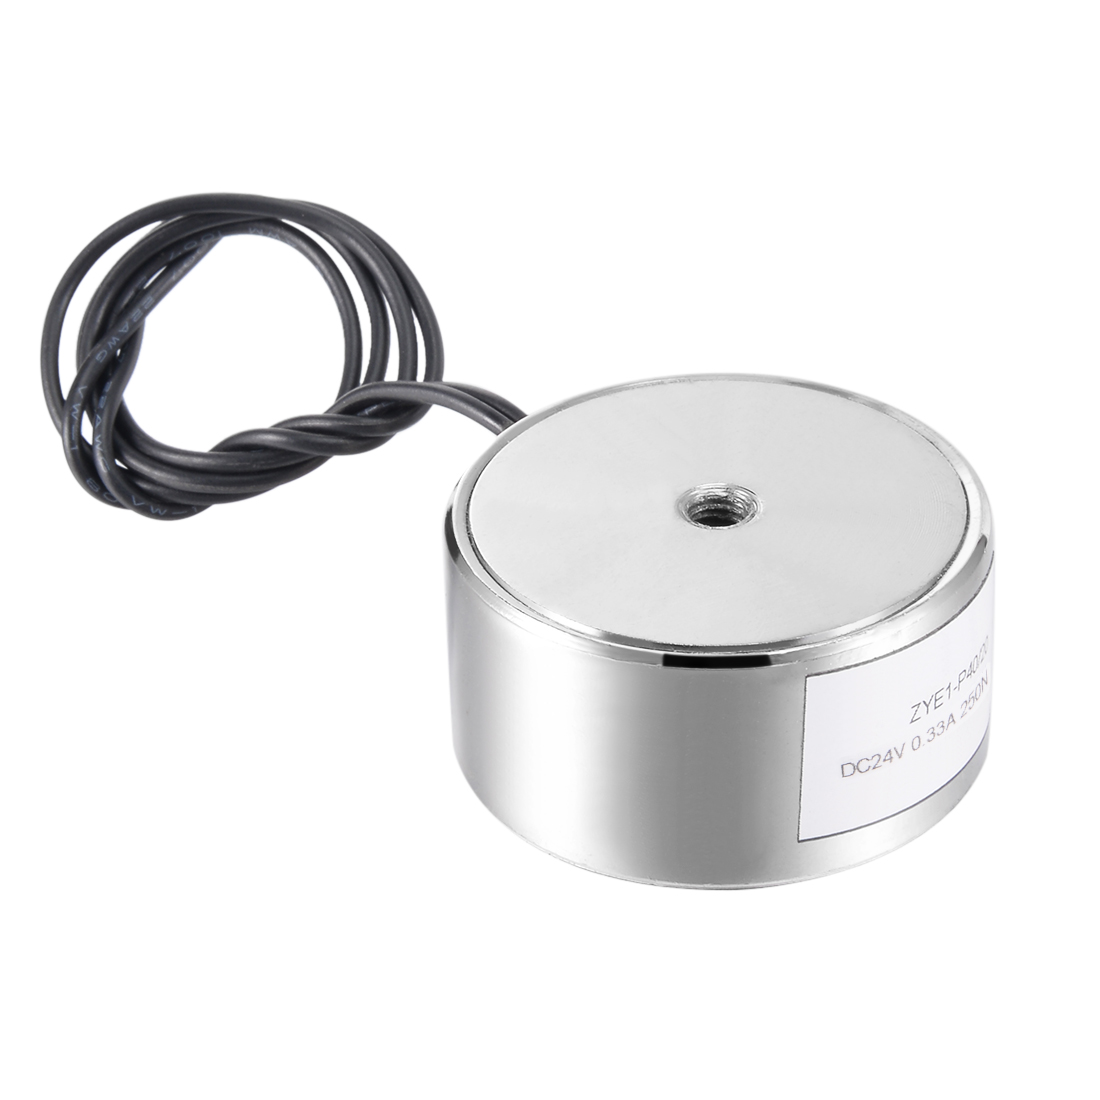 40mm x 20mm DC24V 0.33A 250N Sucking Disc Solenoid Lift Holding Electromagnet